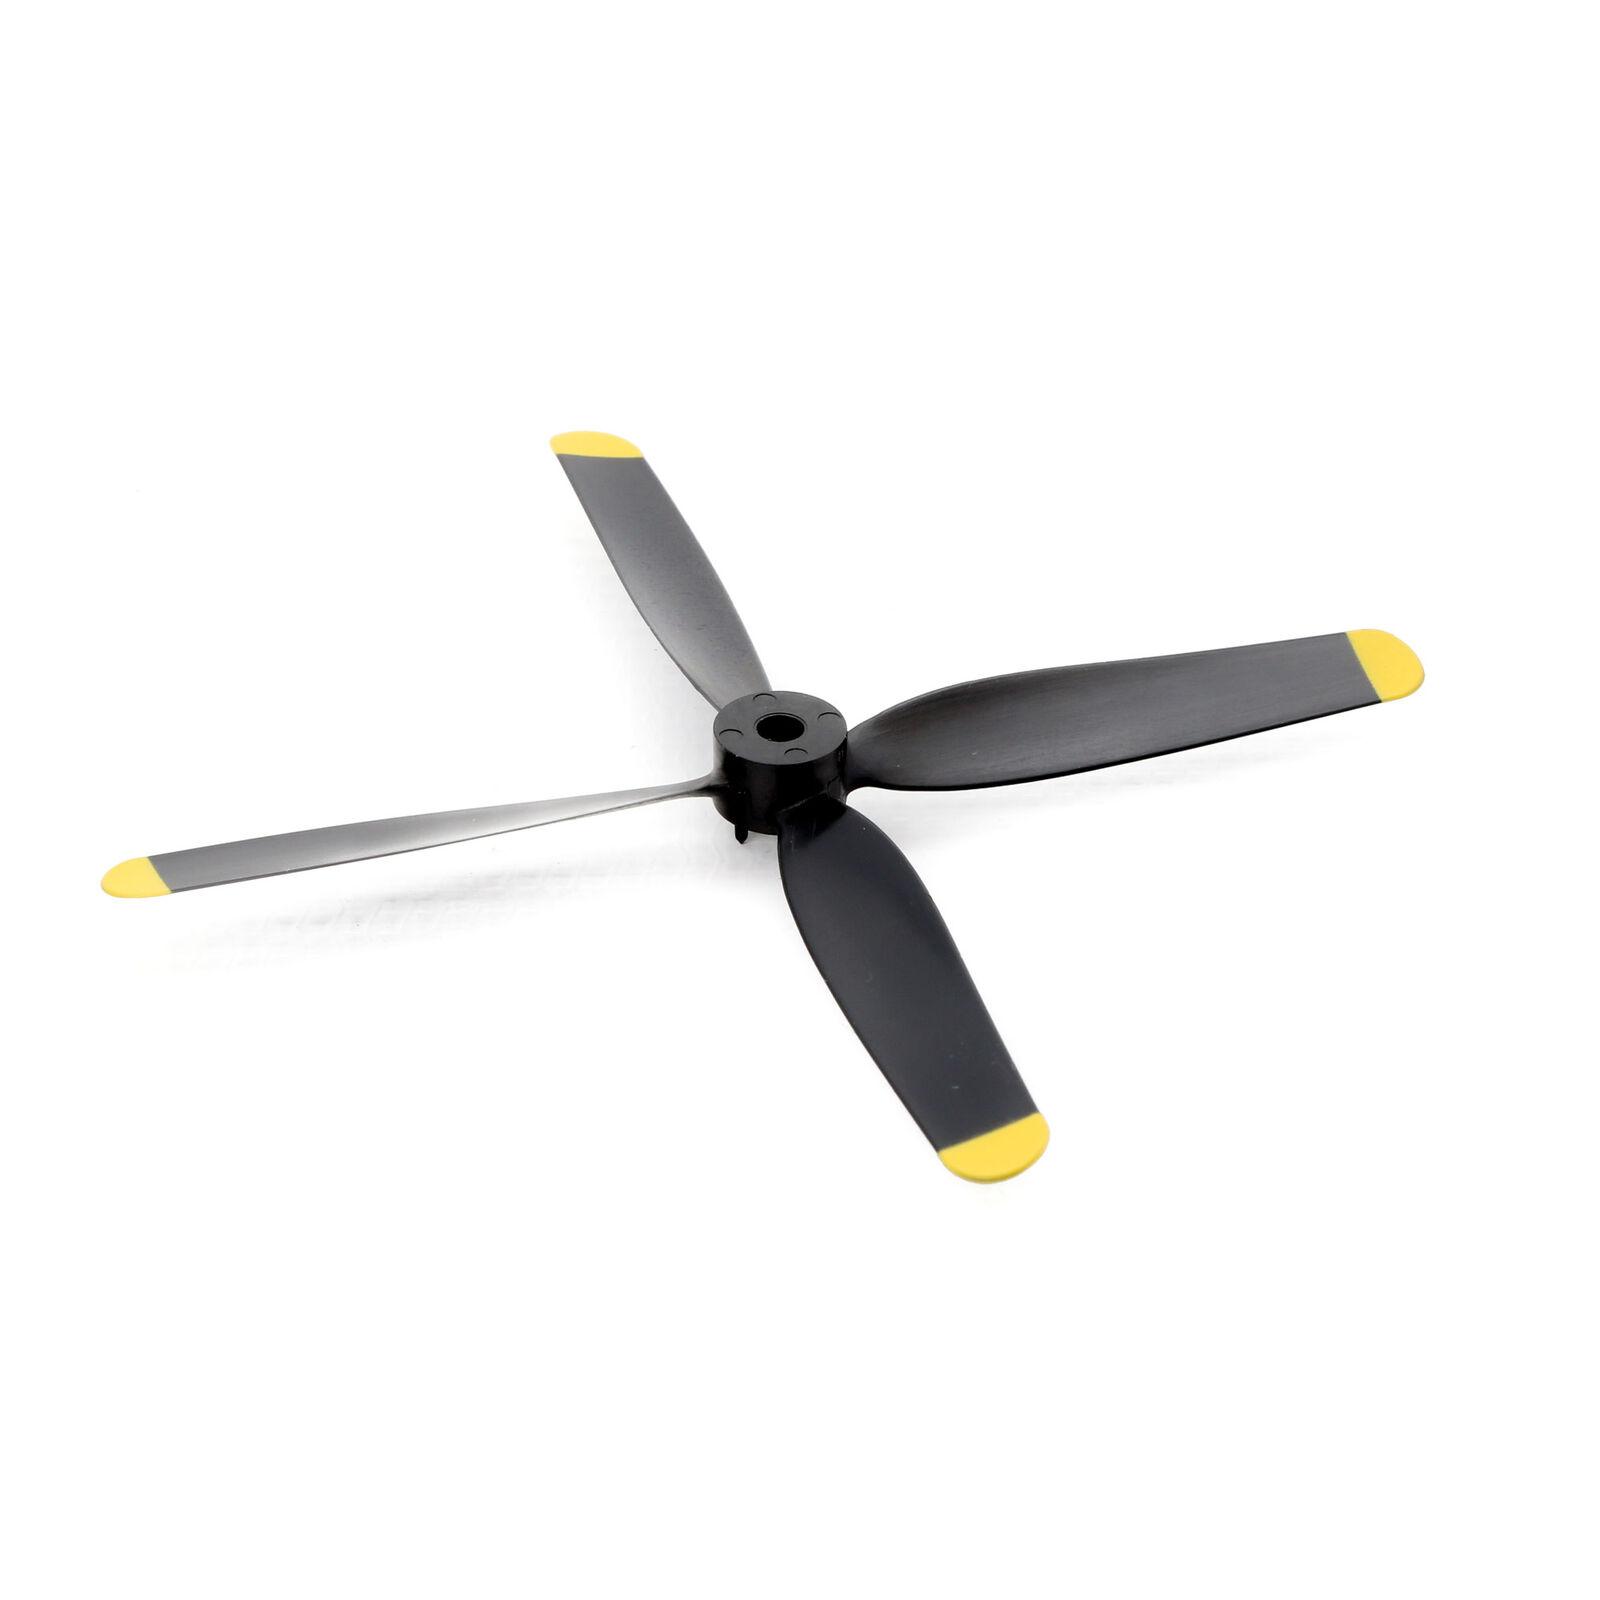 4.5 x 3.0 4-Blade Electric Propeller